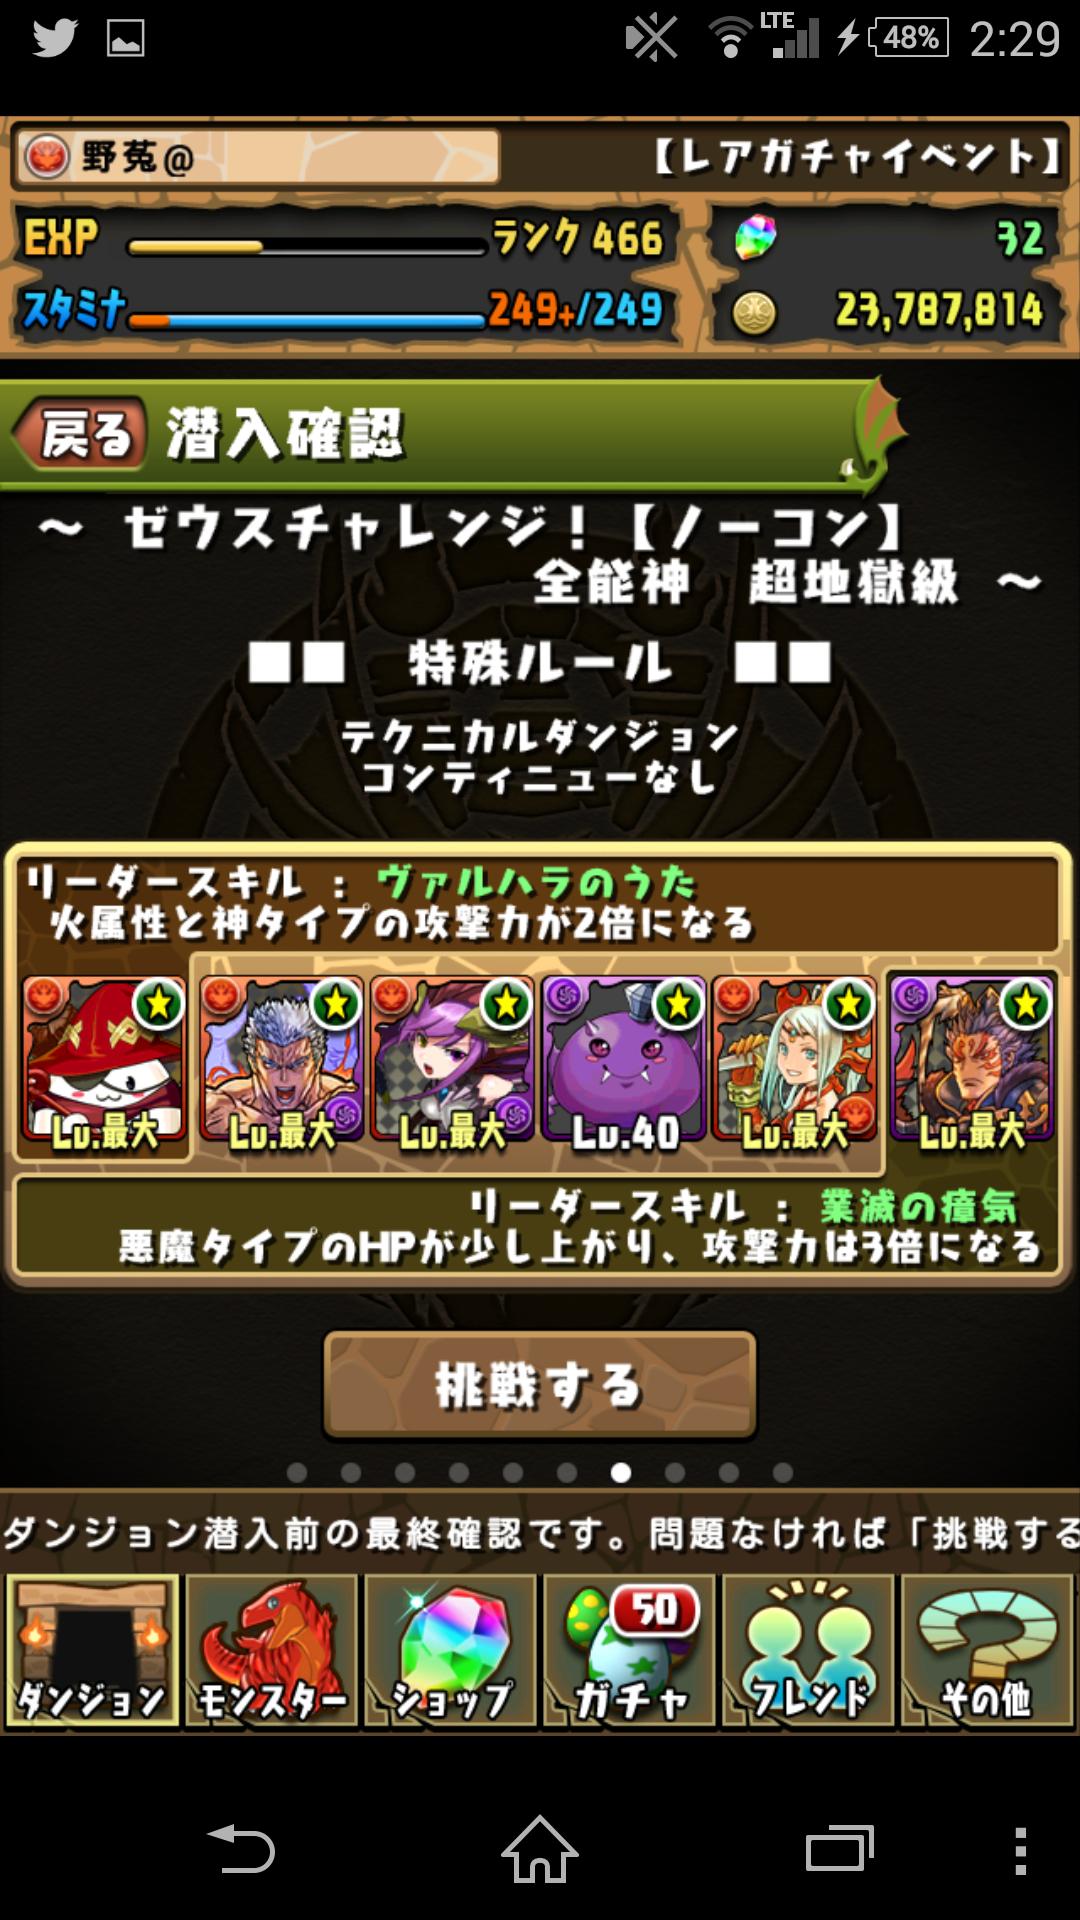 Screenshot_2015-02-18-02-29-29.png